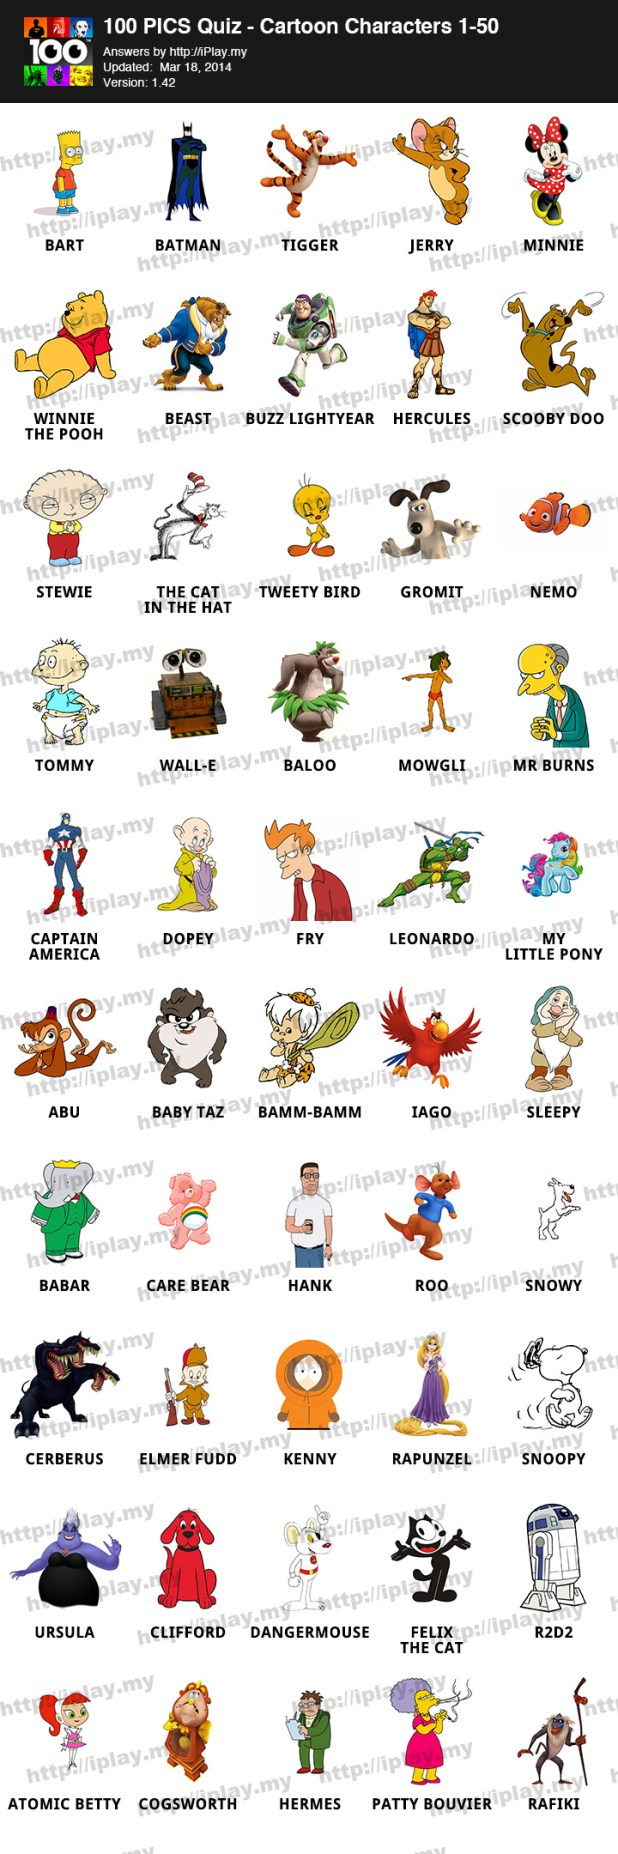 Anime Characters Quiz Answers : Cartoon character quiz iphone answers fandifavi